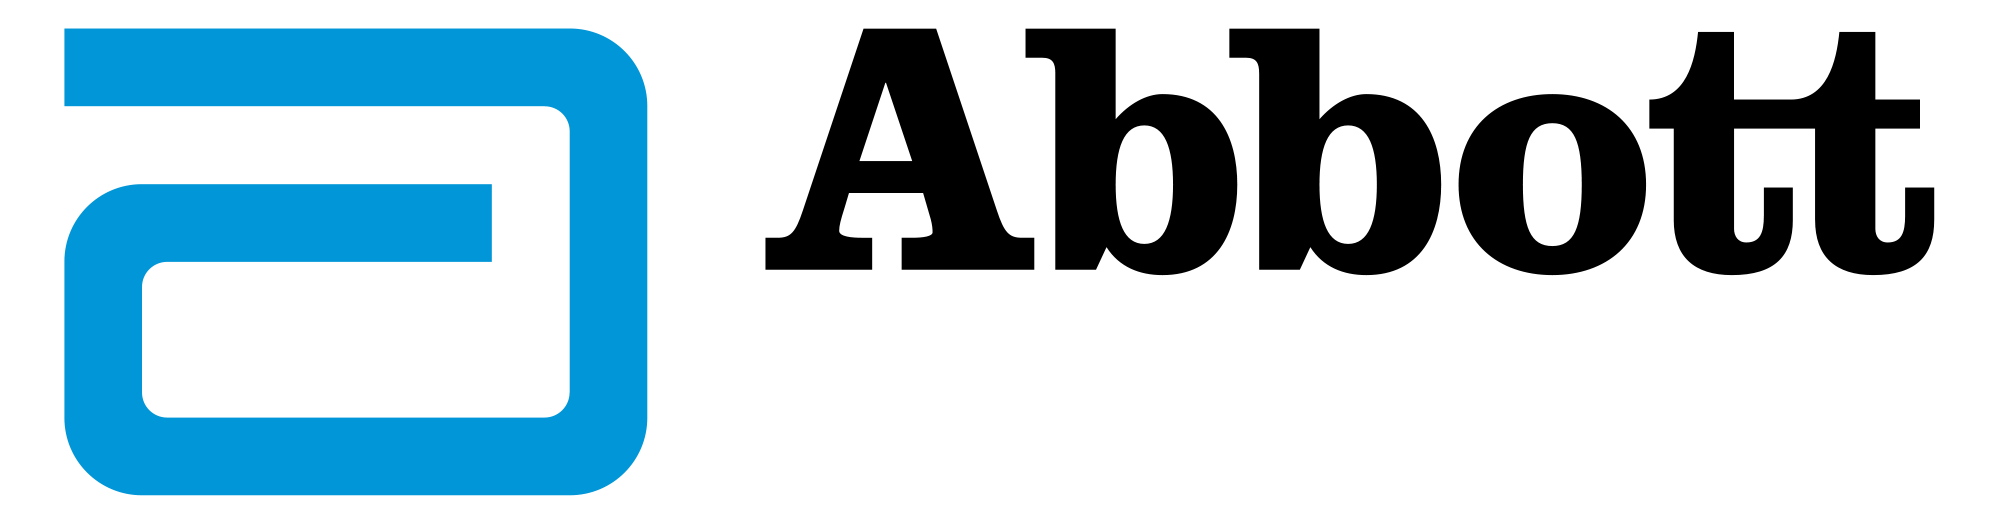 Galderma Logo.